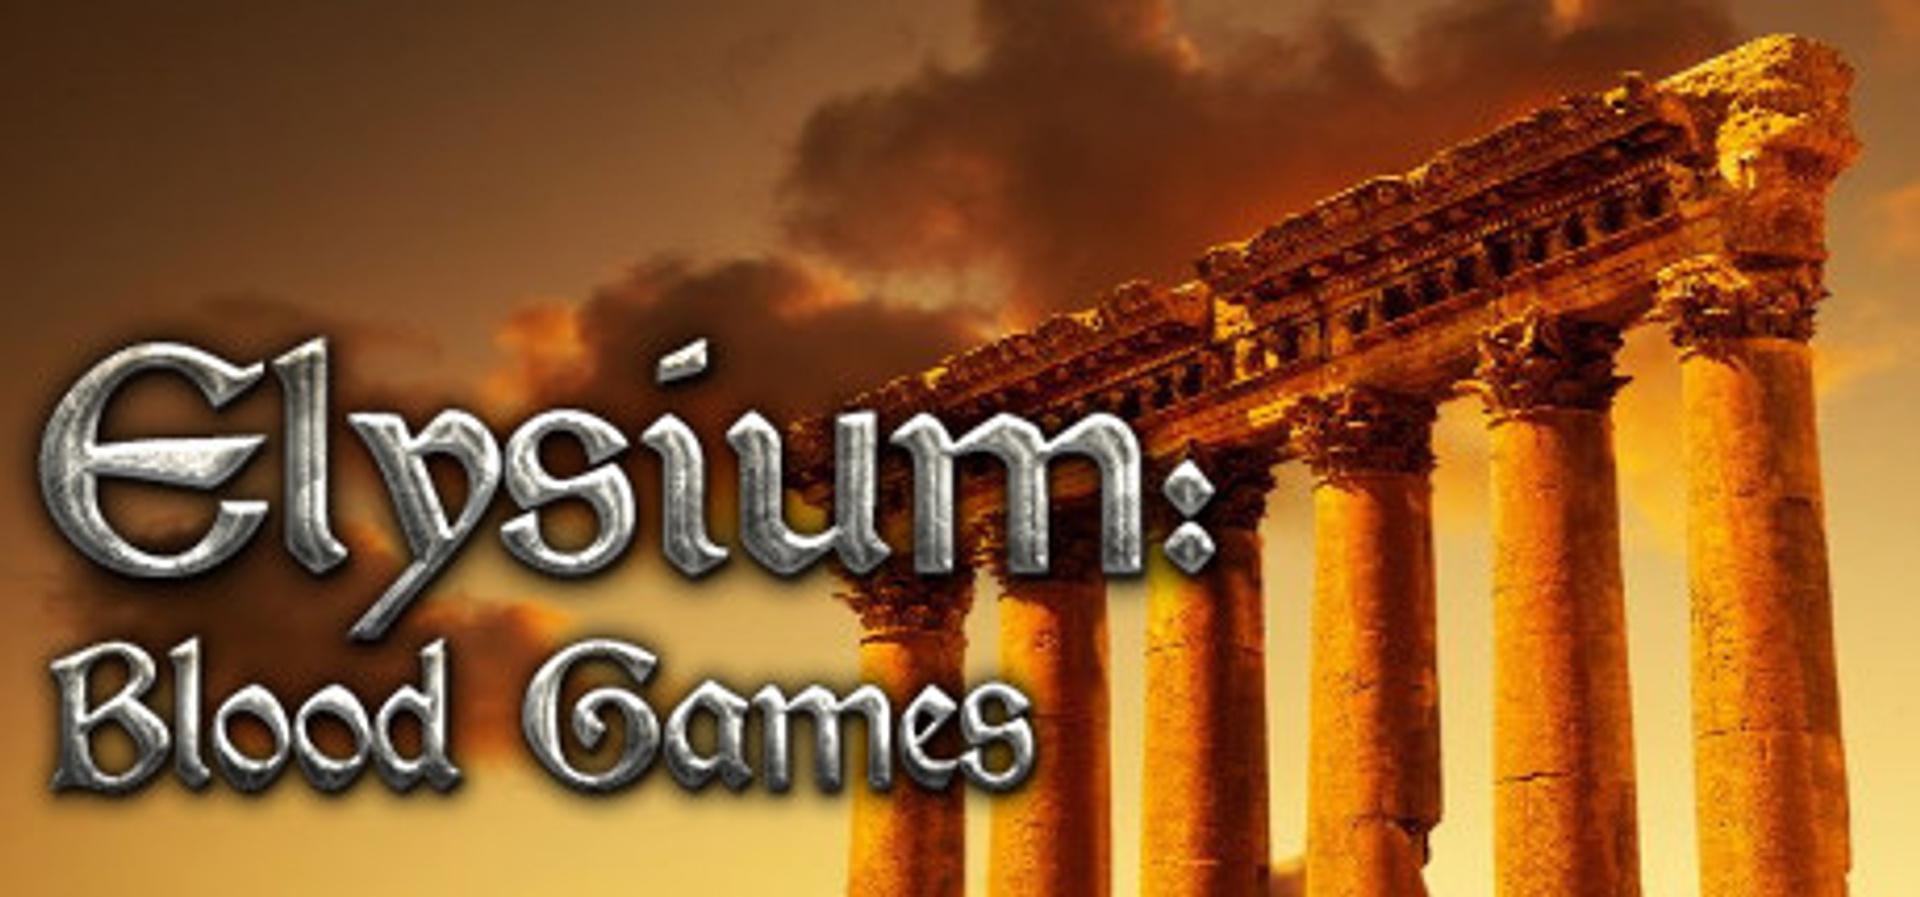 buy Elysium: Blood Games cd key for pc platform